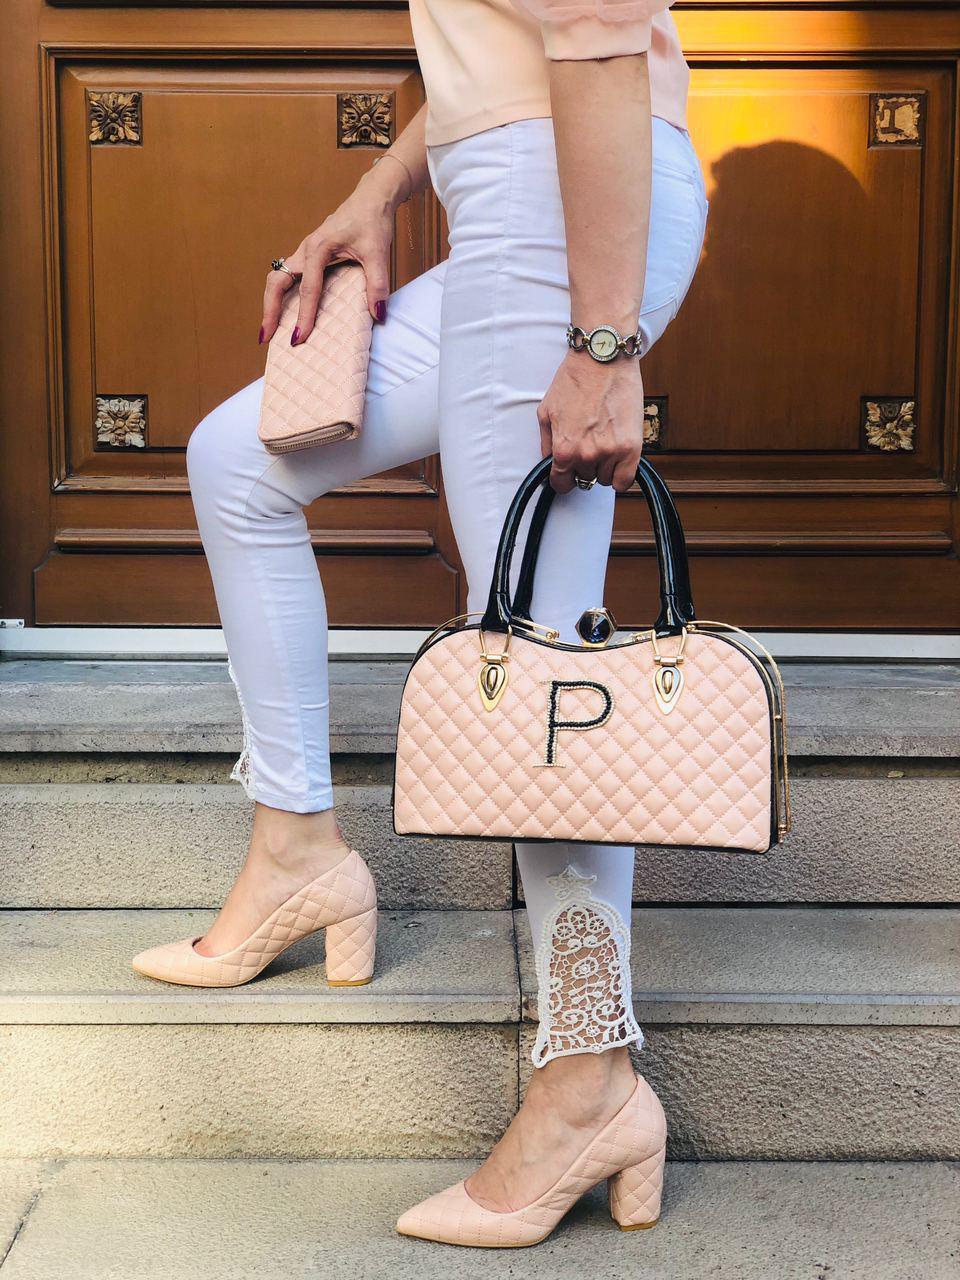 Women bag wallet and shoe